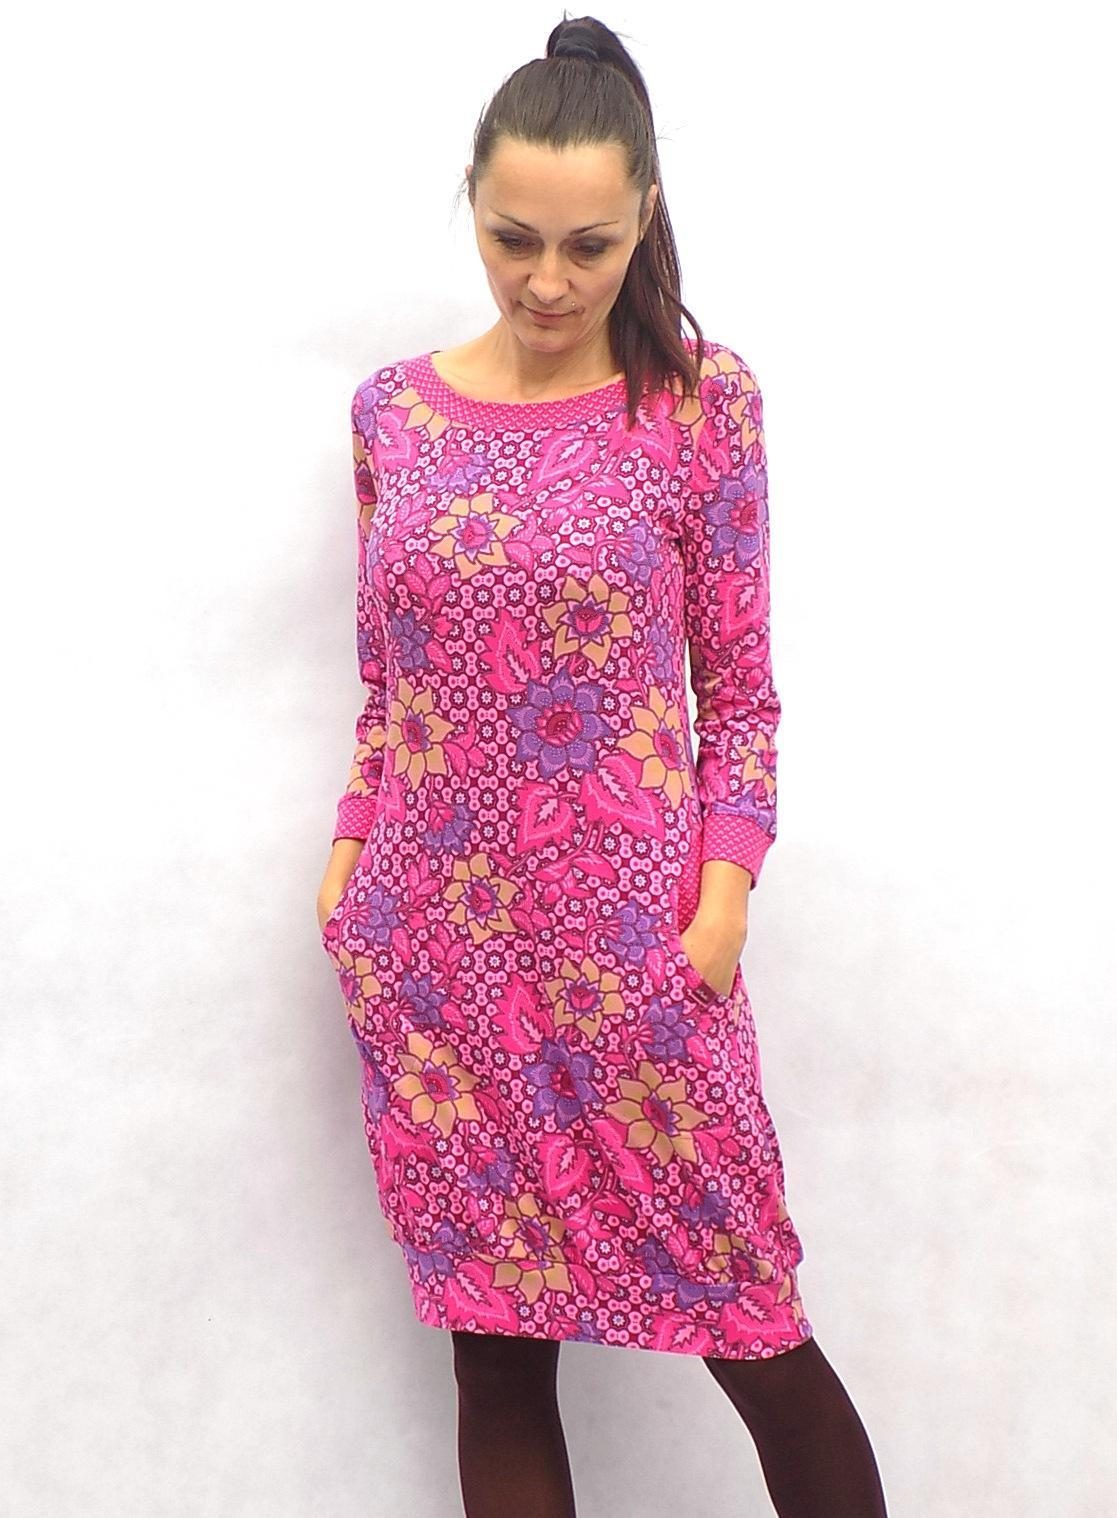 Růžovo-cyklámové balónové šaty...vel. M   Zboží prodejce LaPanika ... d2c326b3b0e